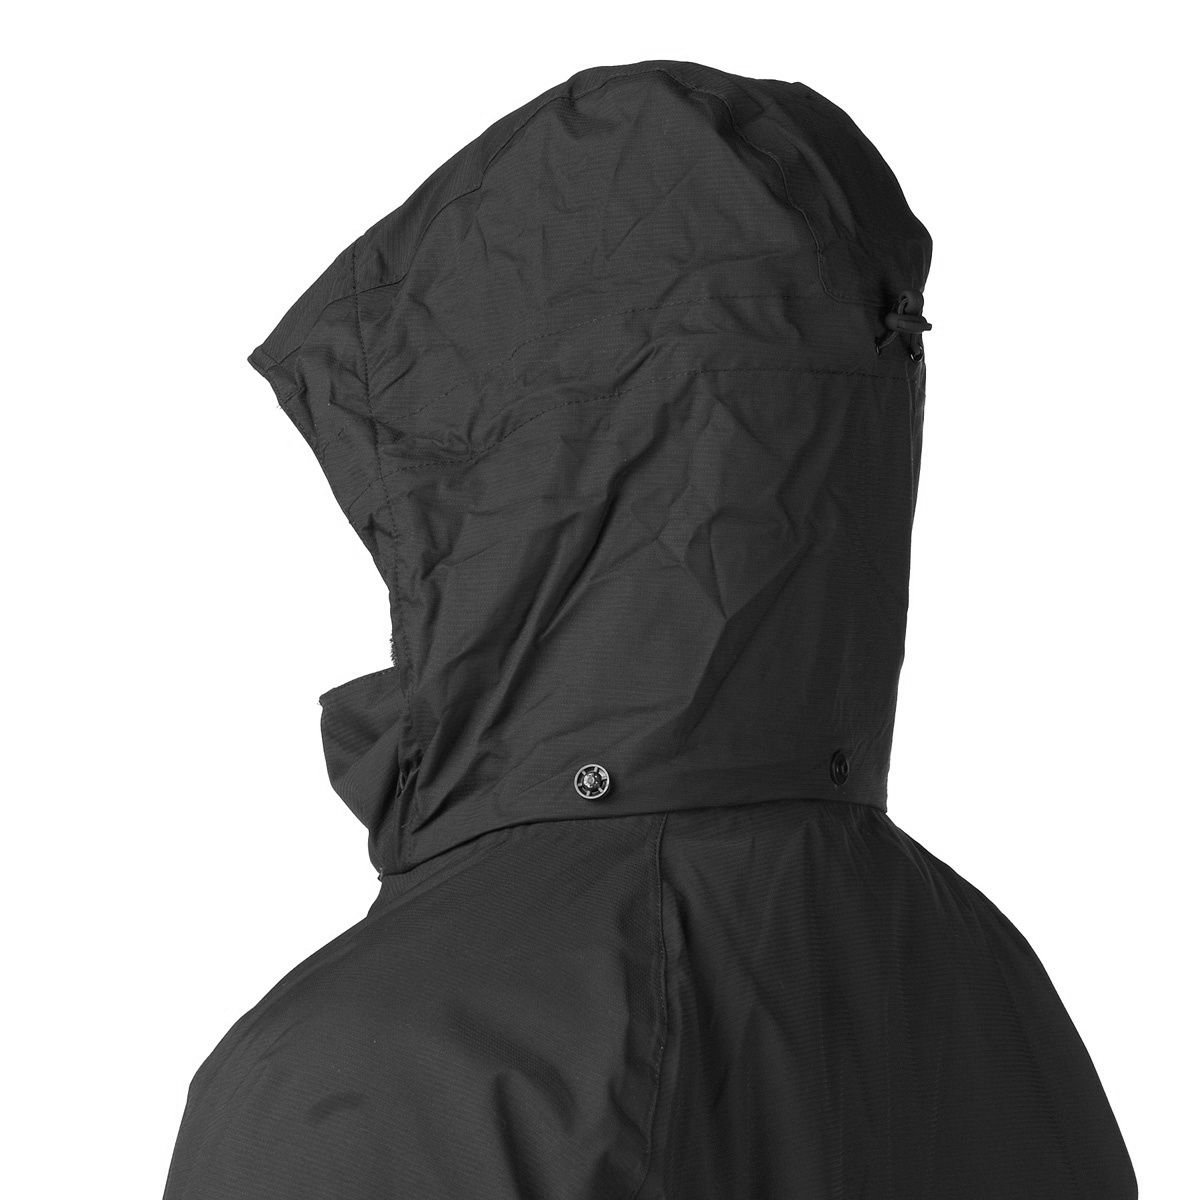 980a78d2fc Sprayway Mens Griffin 3 in 1 Jacket Black Medium: Amazon.co.uk: Clothing